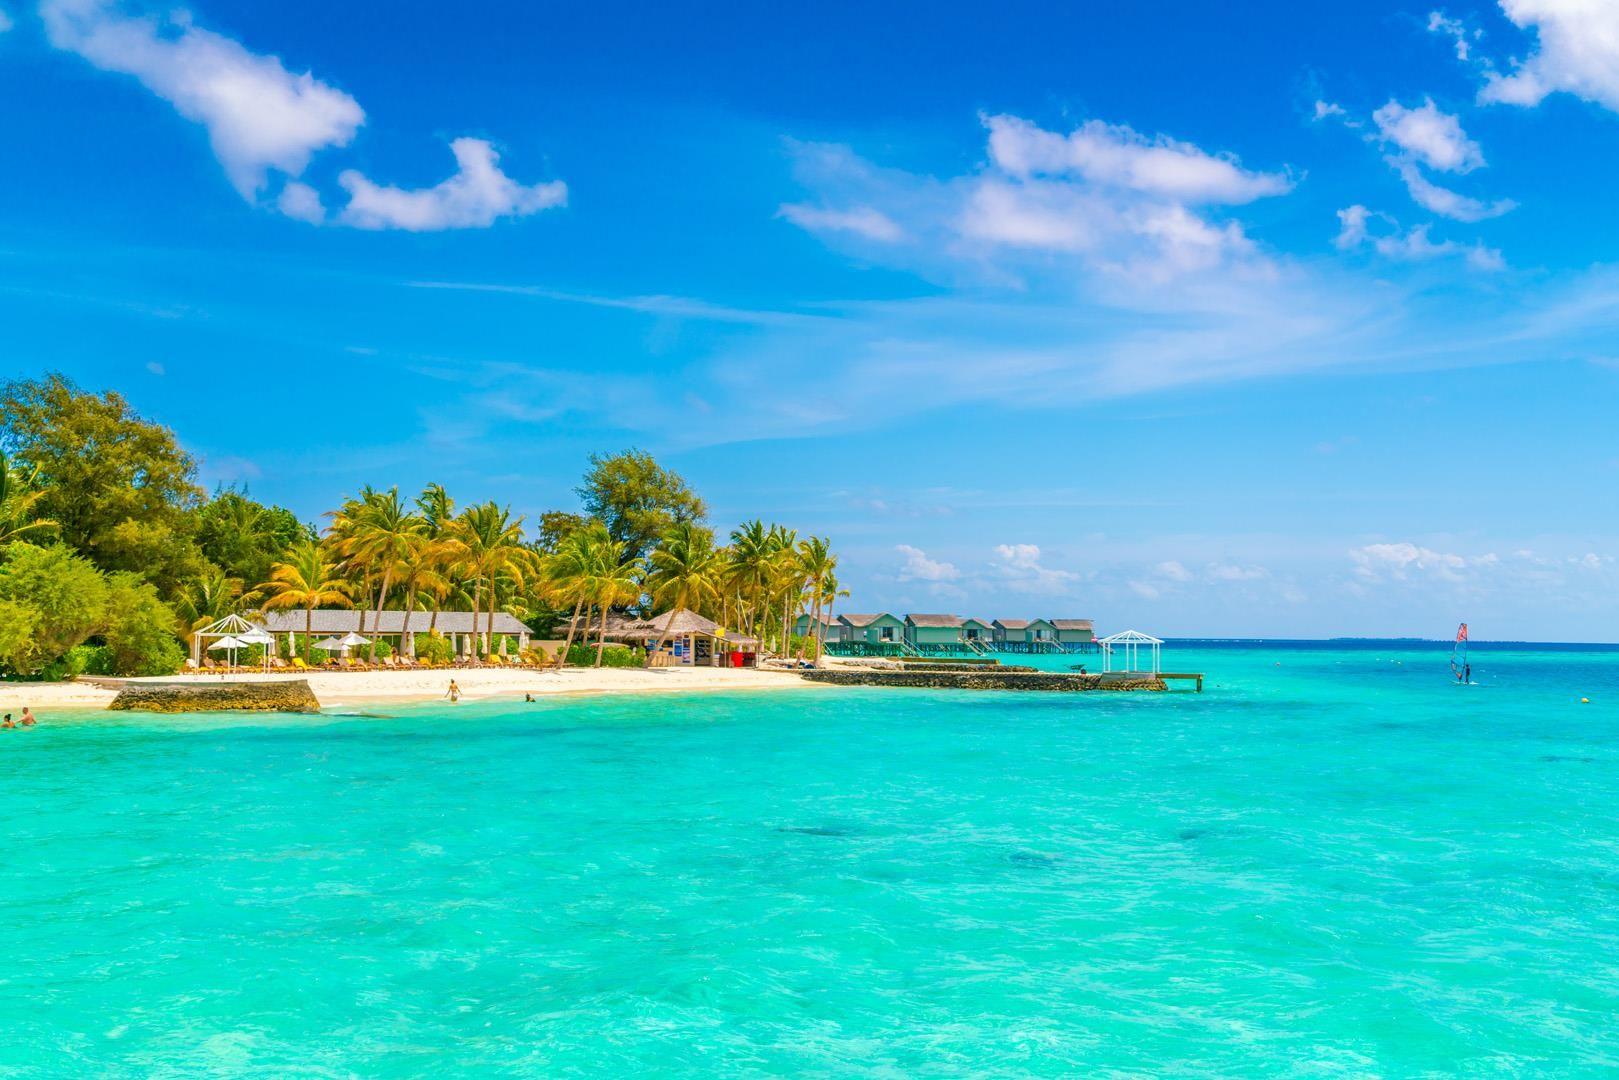 Vacations in Maldives